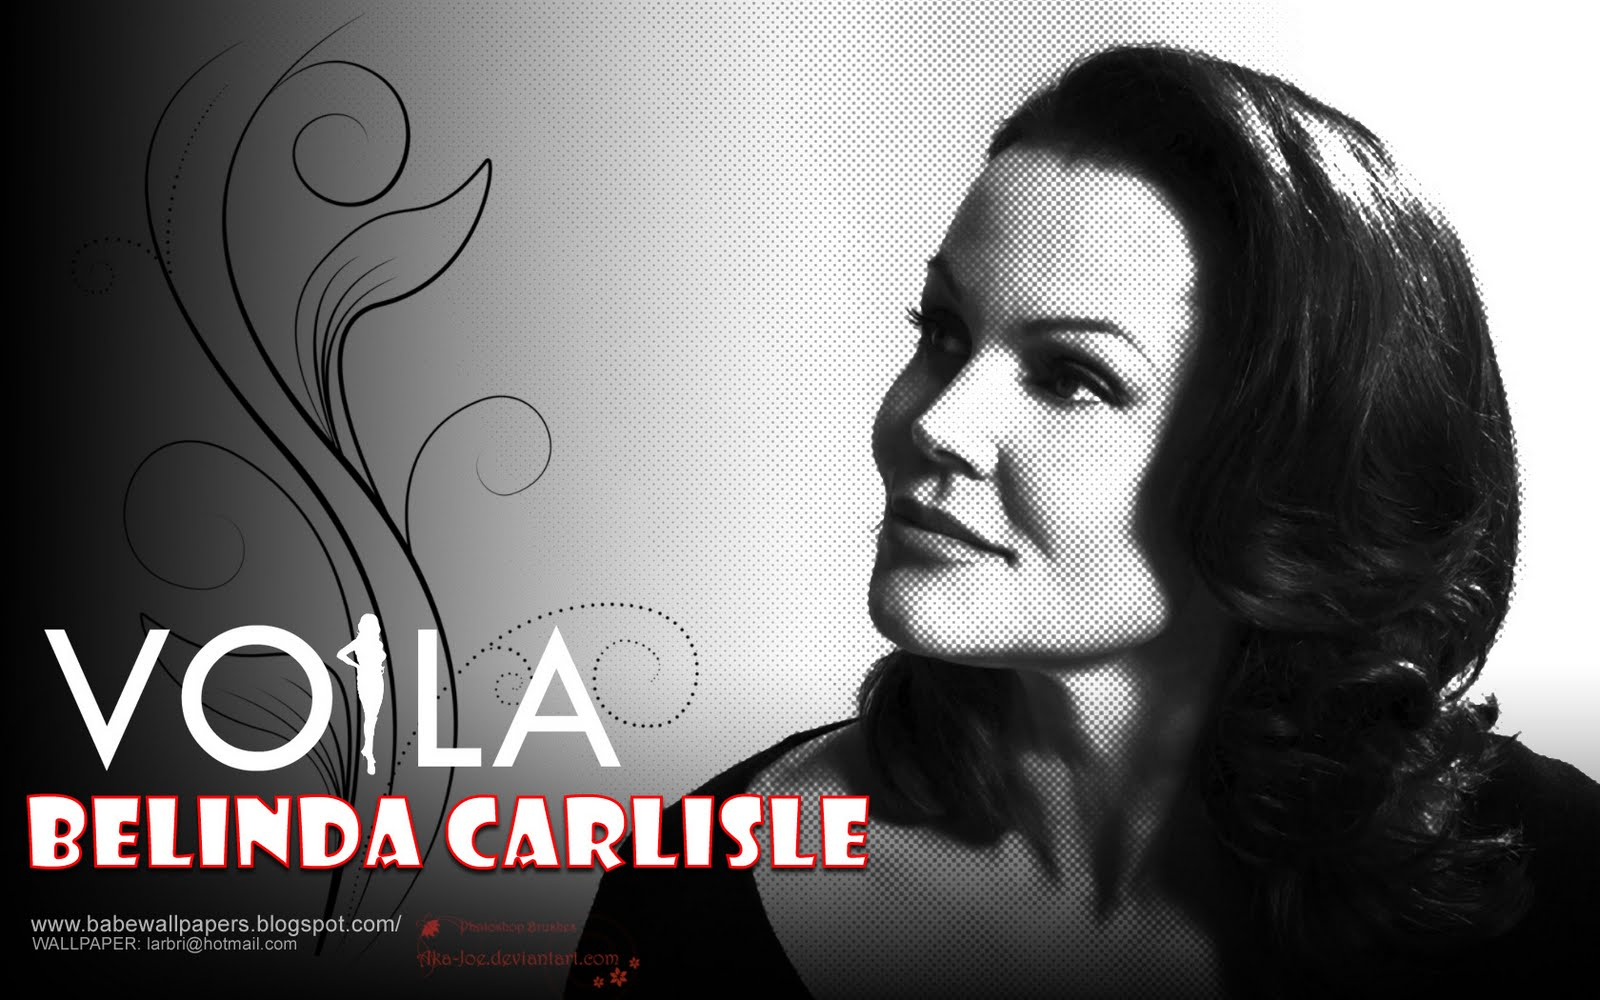 Belinda Carlisle Fanpage The Voila Era Wallpapers